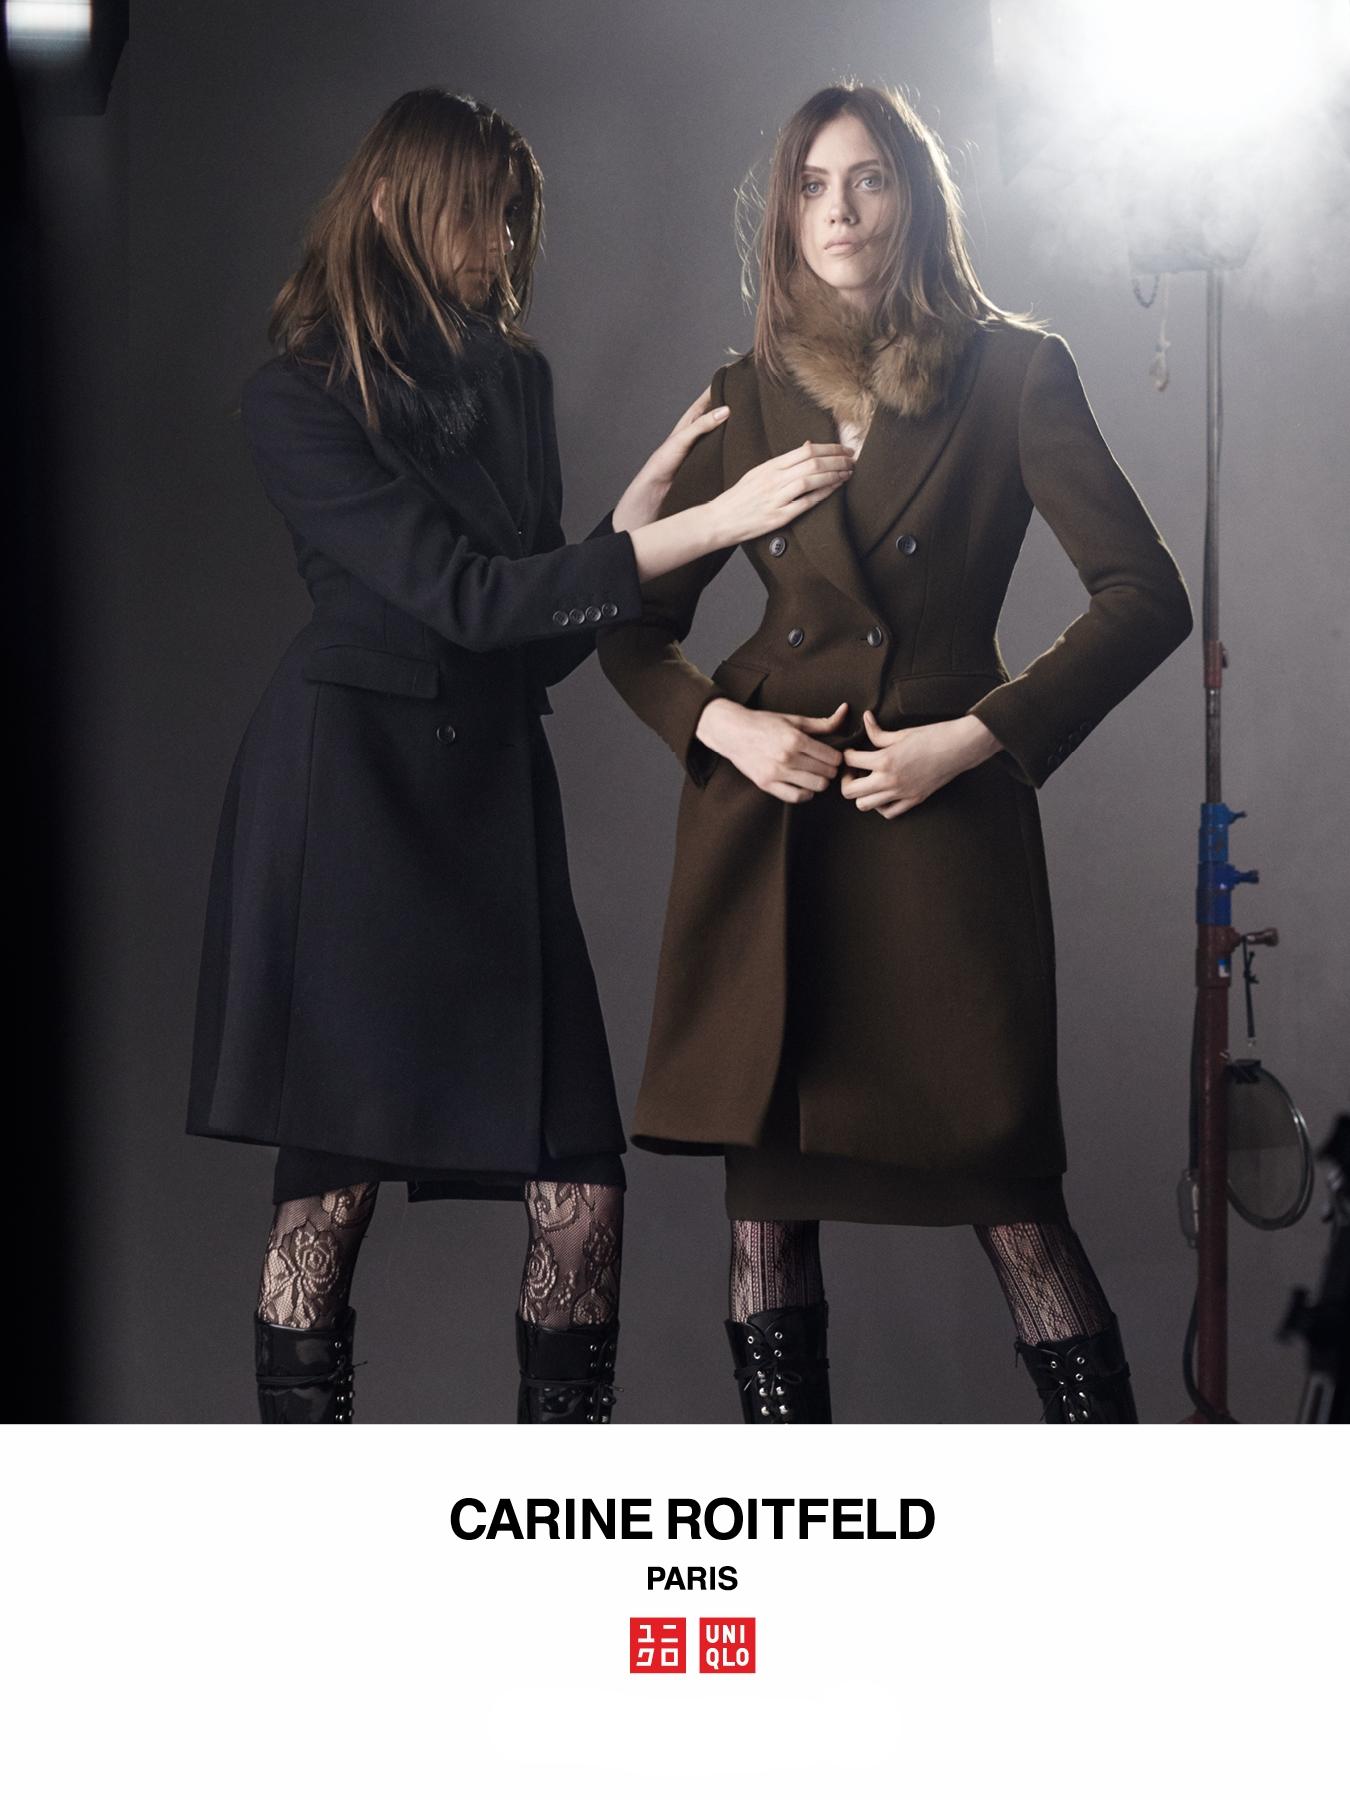 #uniqlo #carineroitfeld #stevenmeisel #fw16 #fashion #campaign #liapavlova #odettepavlova #jimkaemmerling #patmcgrath #guidopalau